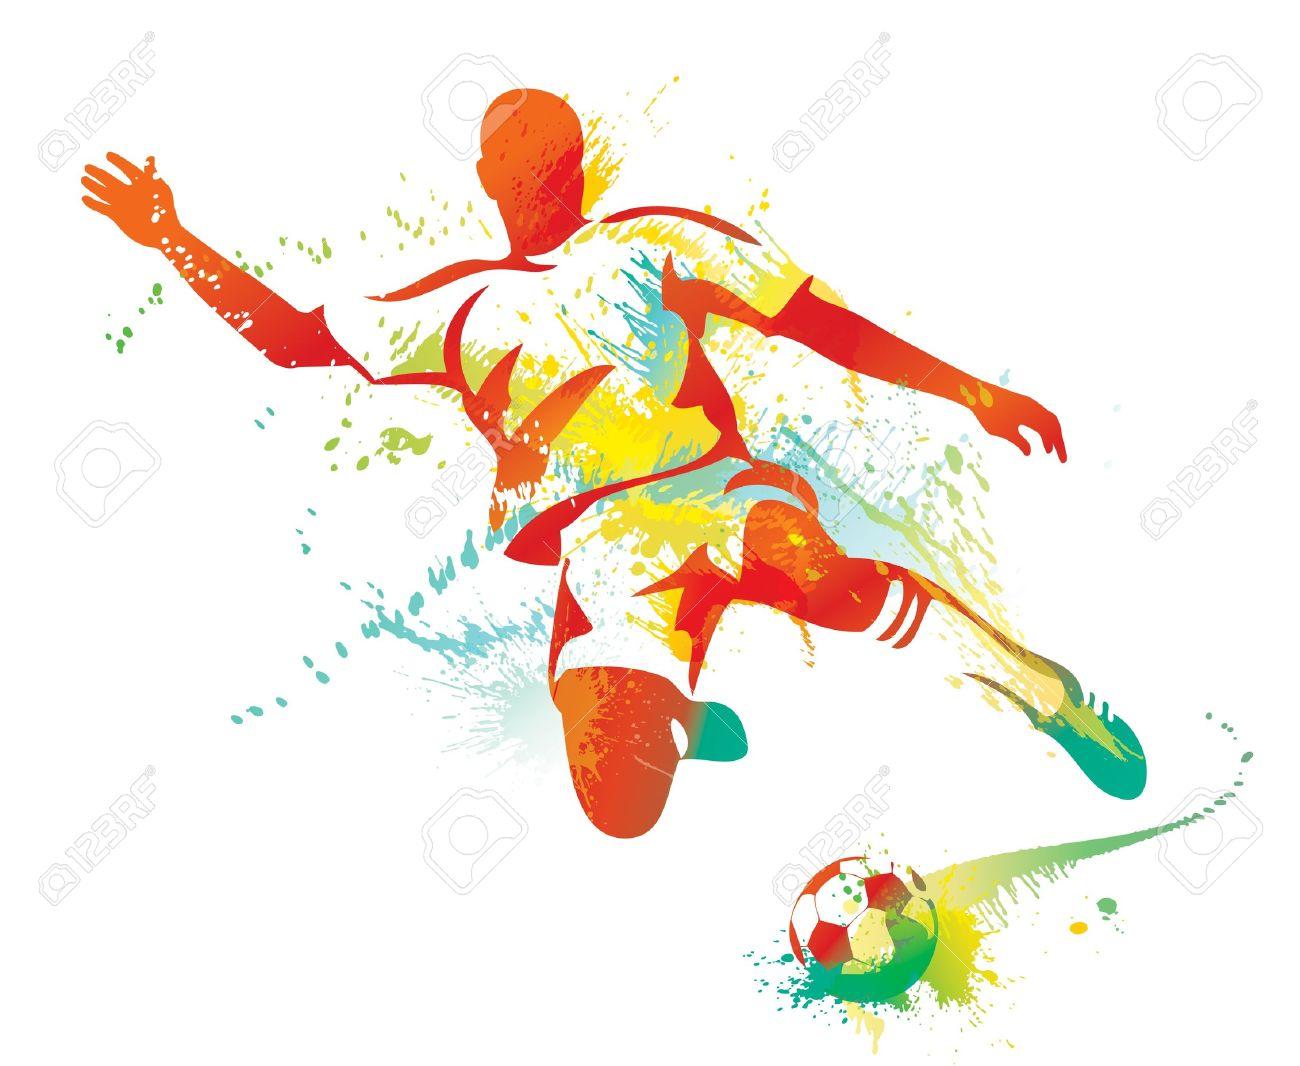 Soccer player kicks the ball. Vector illustration. - 10737678